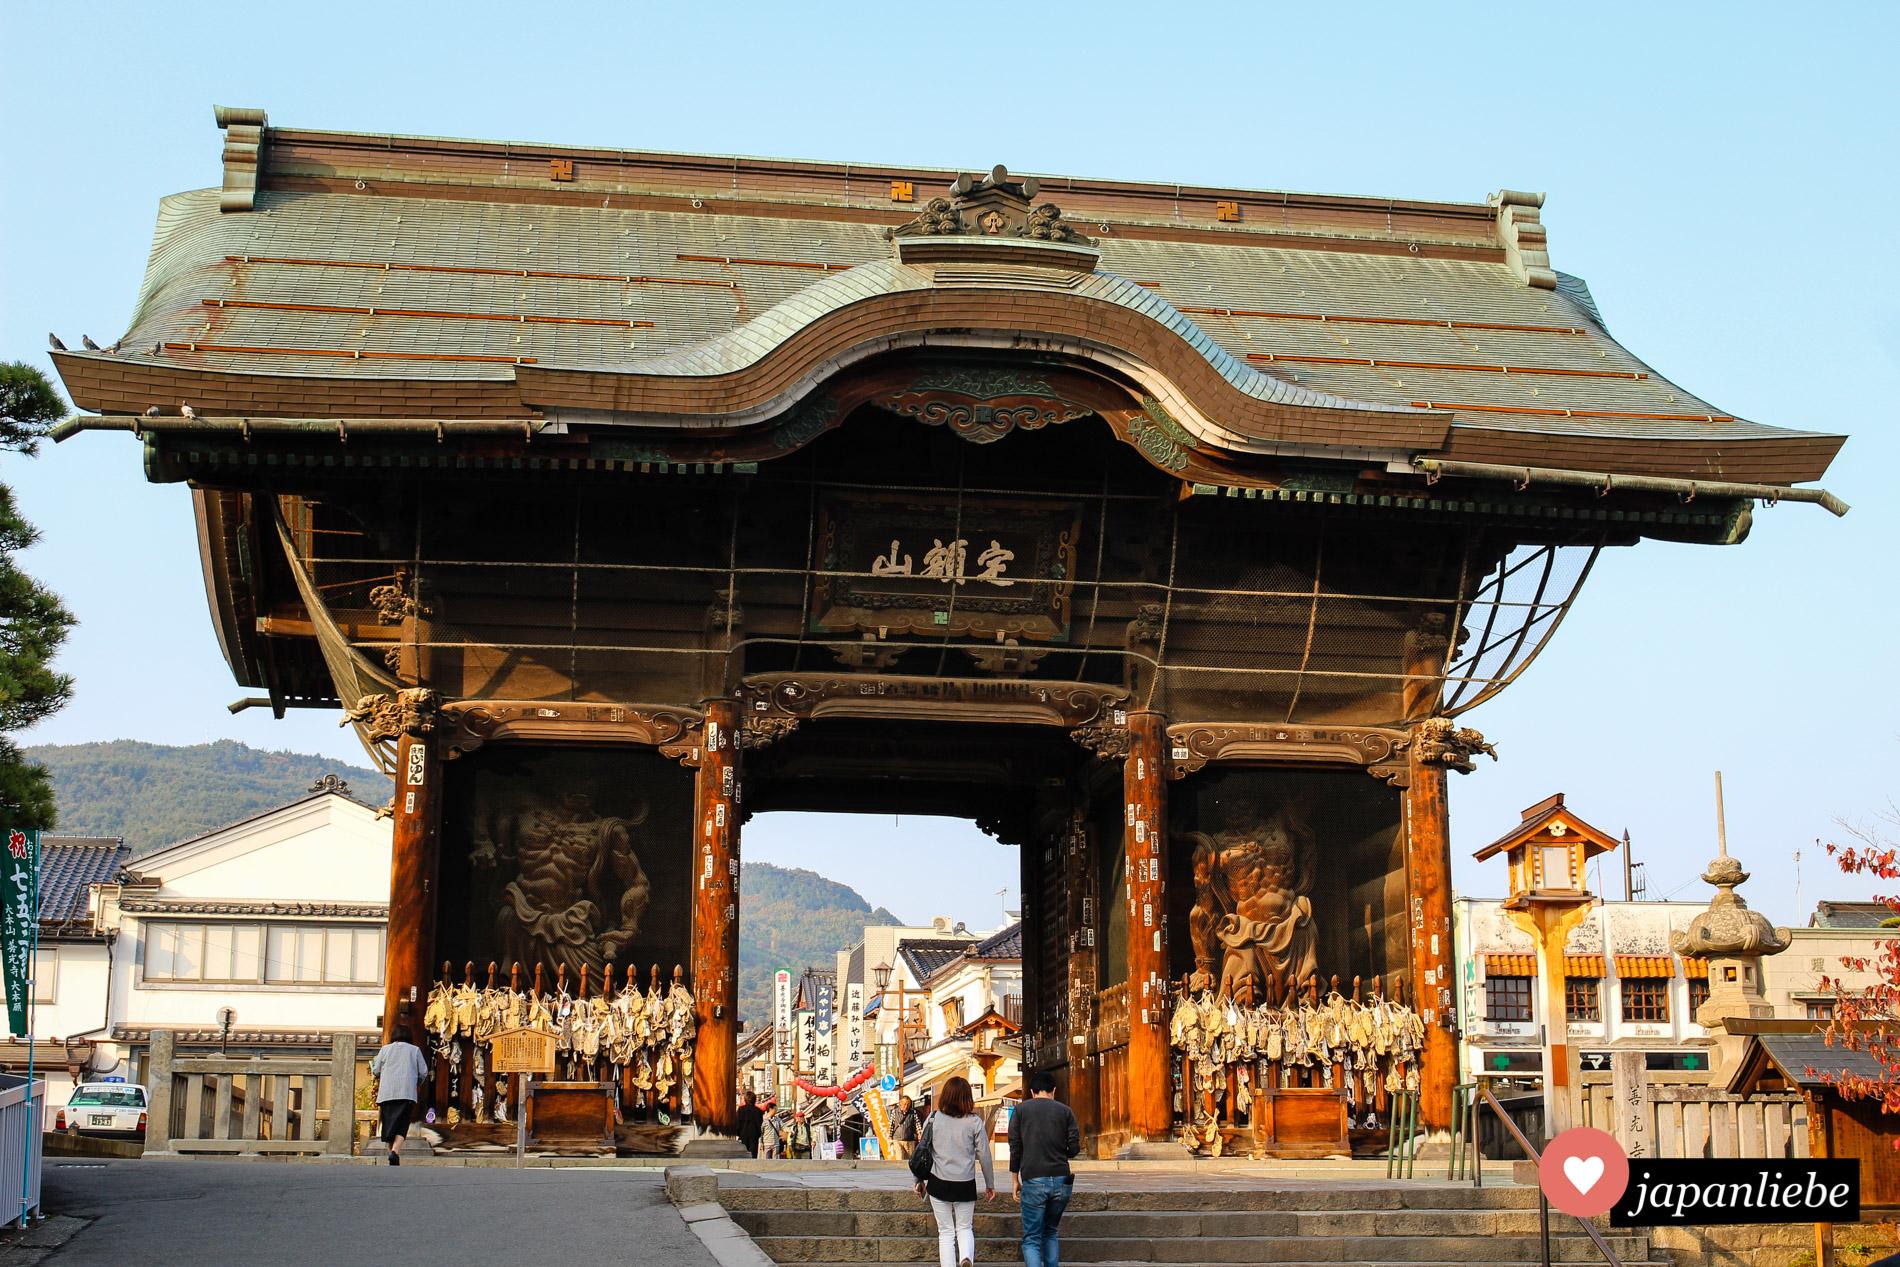 Das Tor zum Zenkō-ji-Tempel in Nagano.